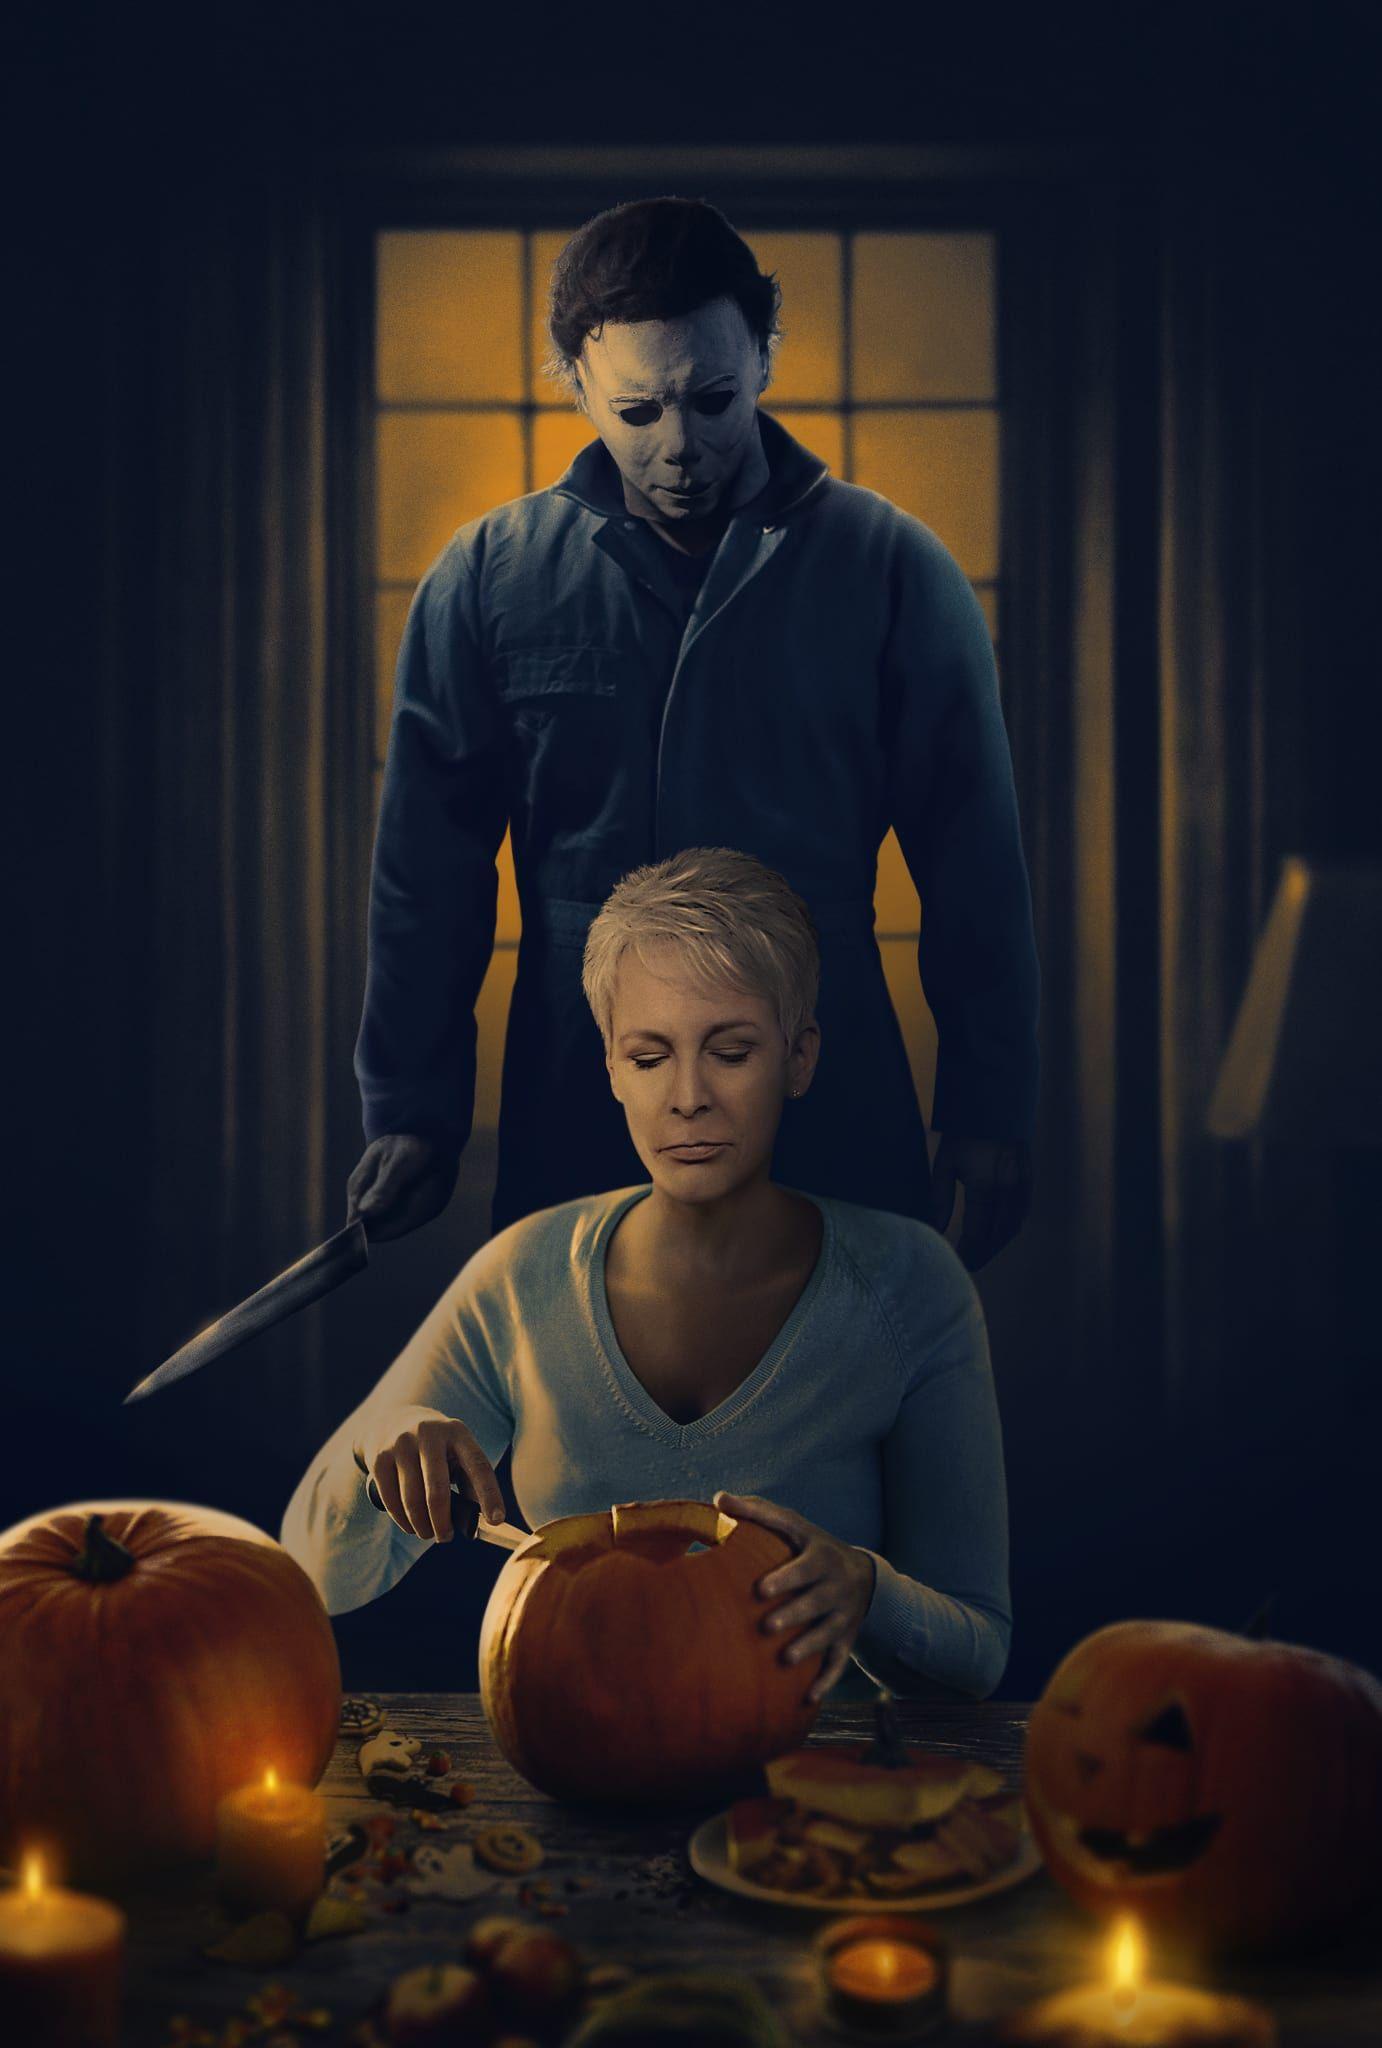 Halloween Film Complet Halloween Film Complet Streaming Vf Halloween Film Complet Vf 2018 Halloween Film Complet Streaming Halloween Film Complet مترجم Hal